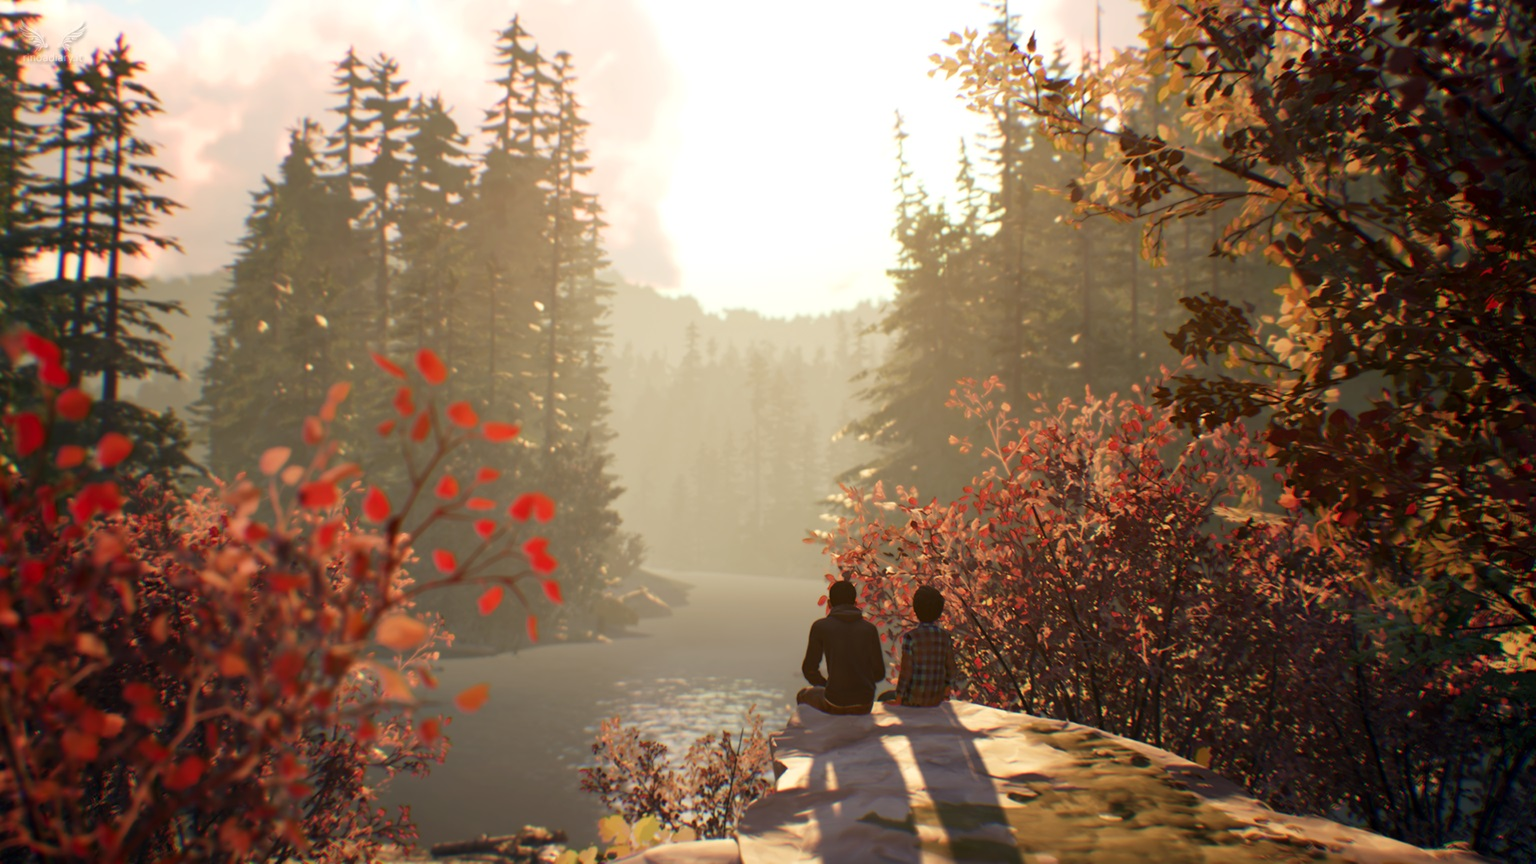 Ecco in anteprima un lungo video gameplay di Life is Strange 2!